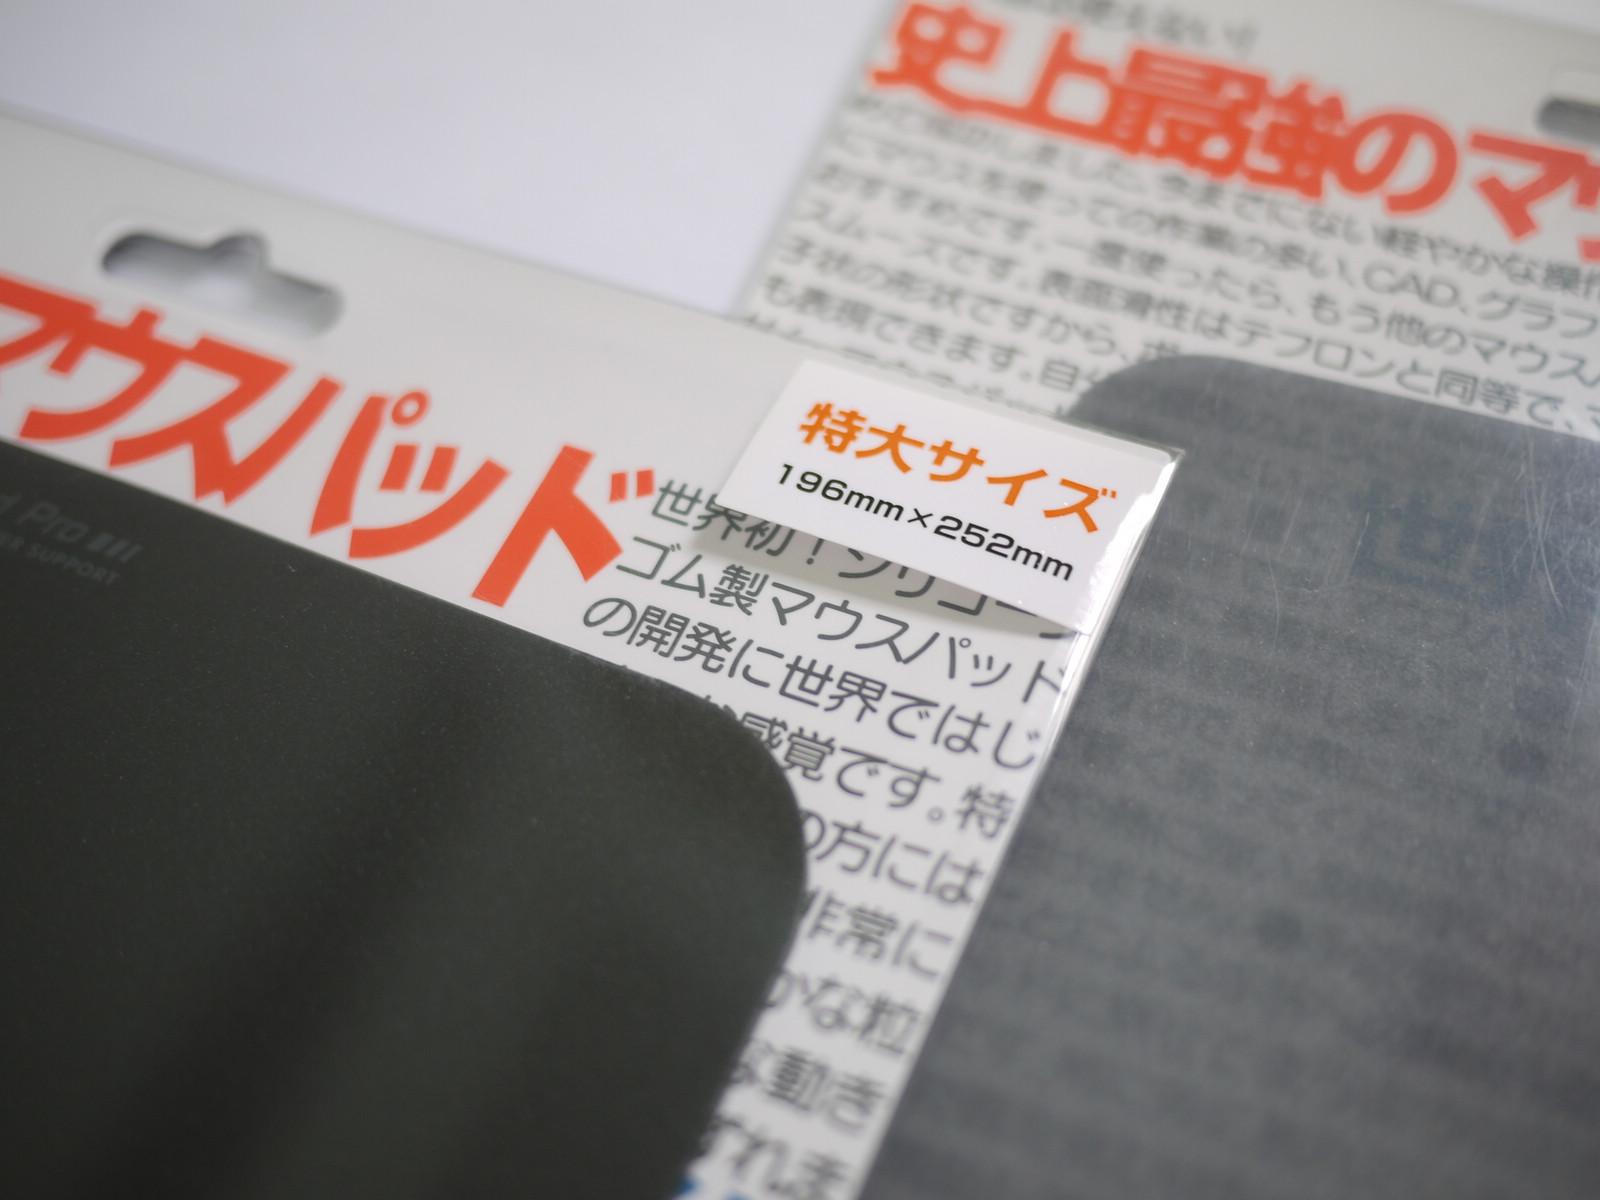 P1060249.JPG